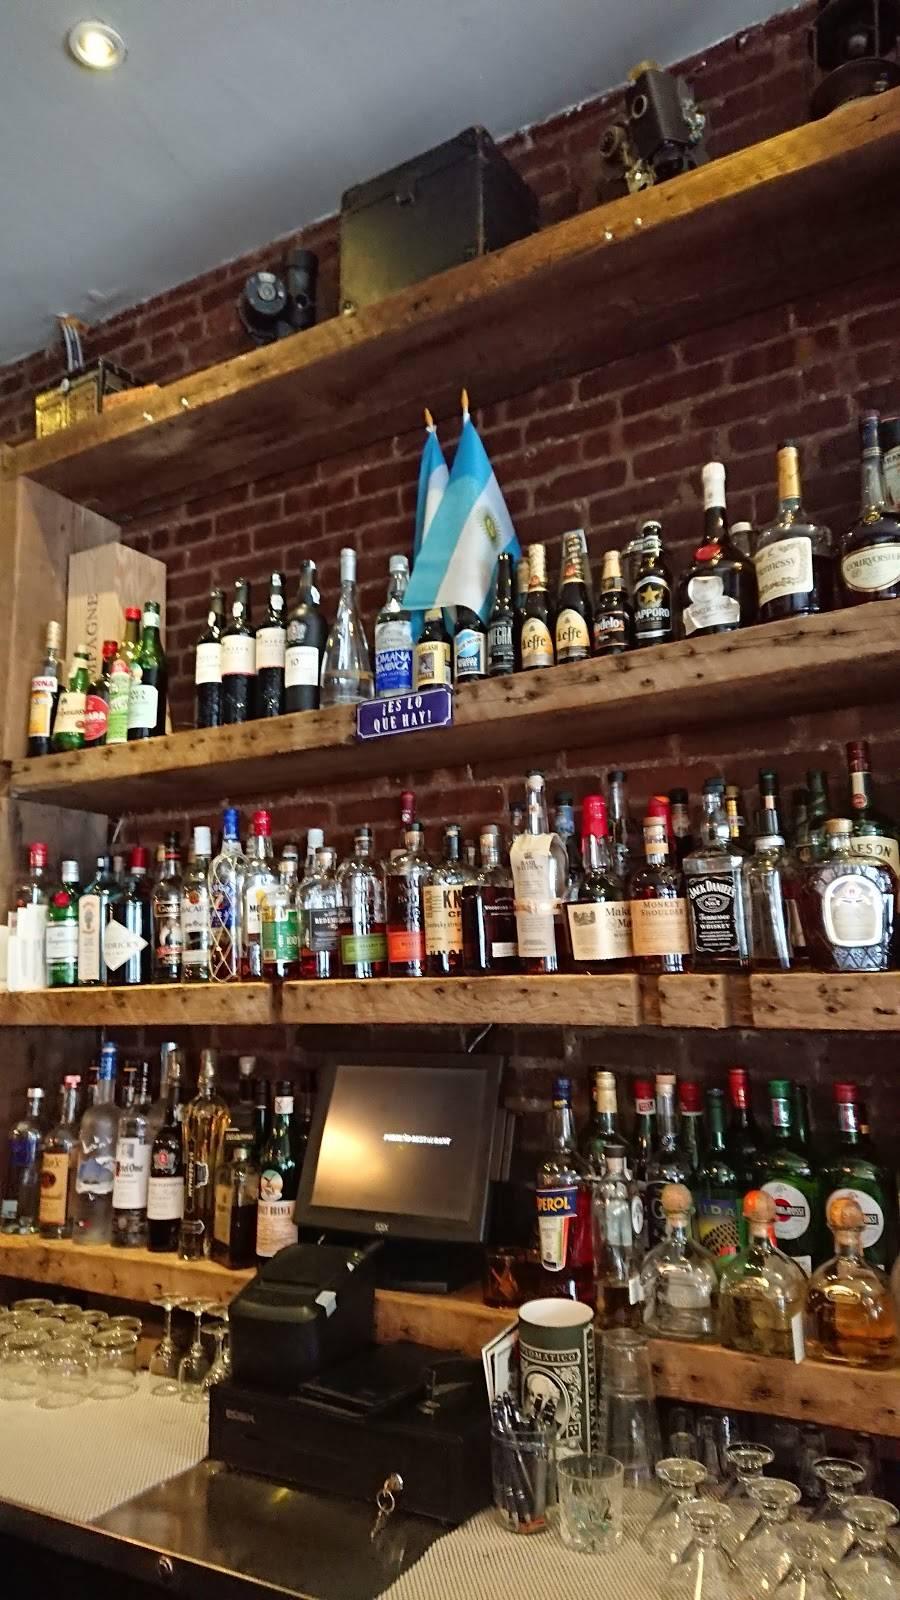 Porteño | restaurant | 299 10th Ave, New York, NY 10001, USA | 2126959694 OR +1 212-695-9694